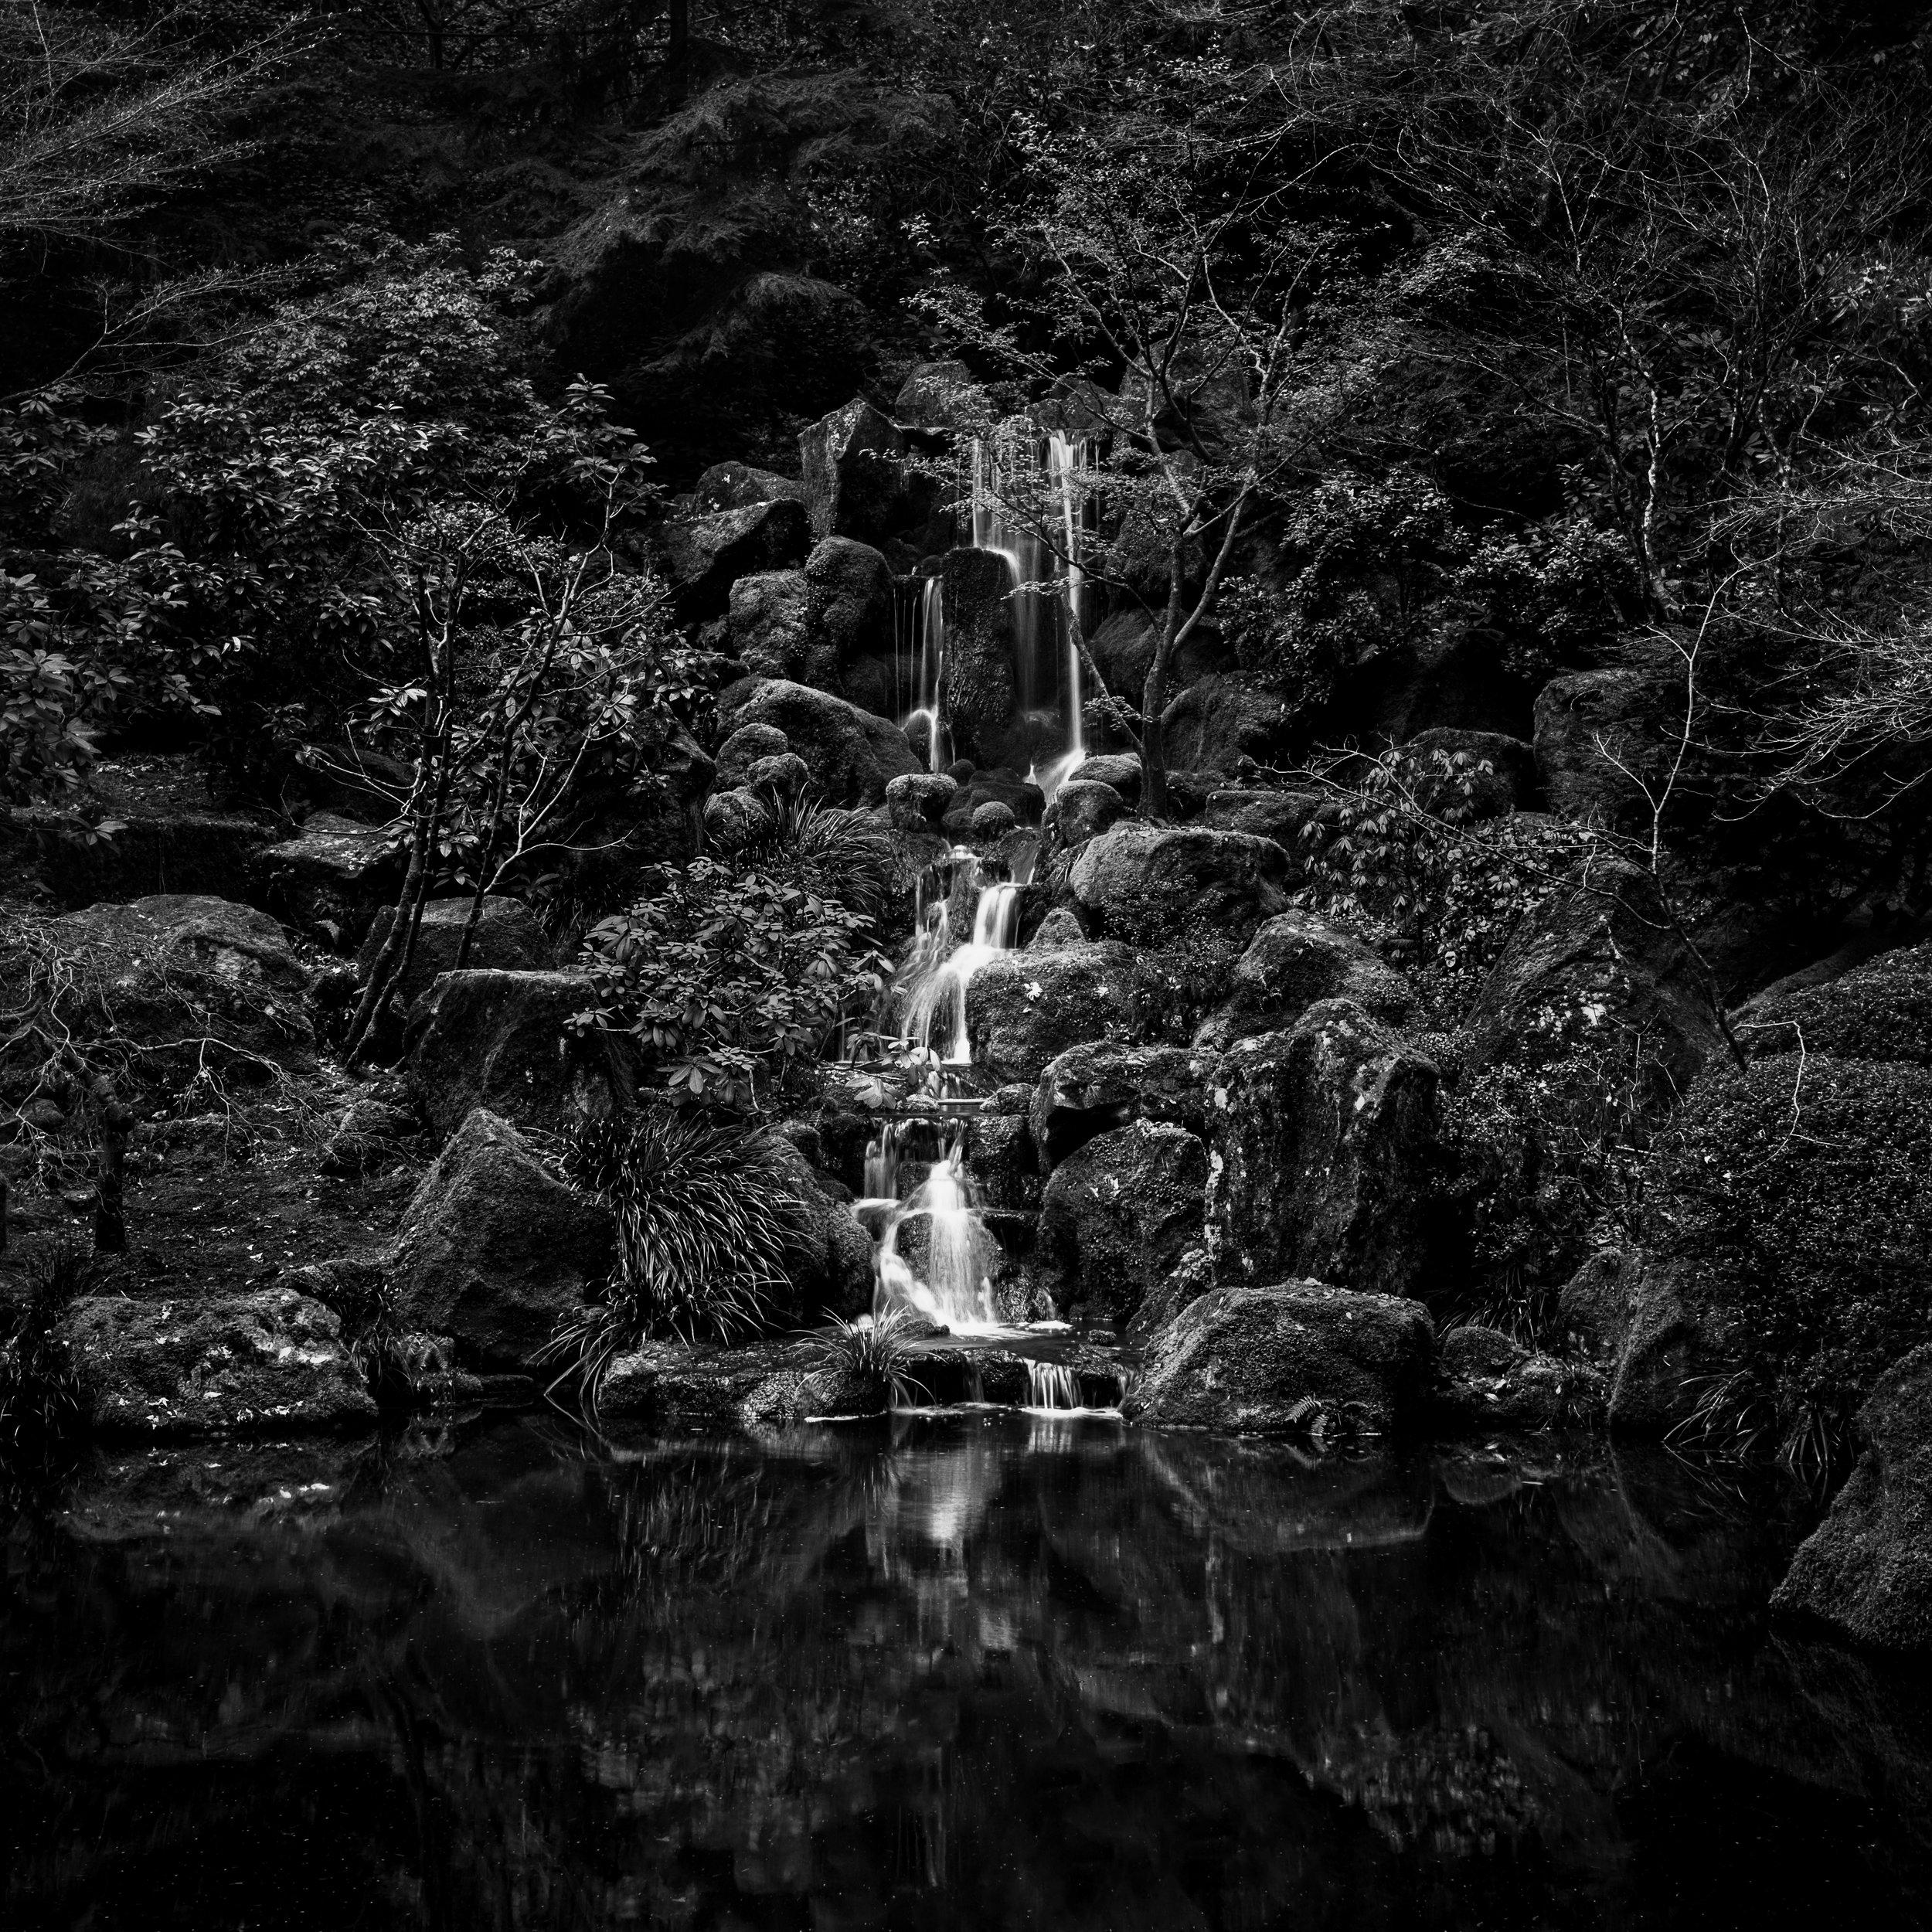 Portland japanese garden black white pond waterfall zen peaceful calm